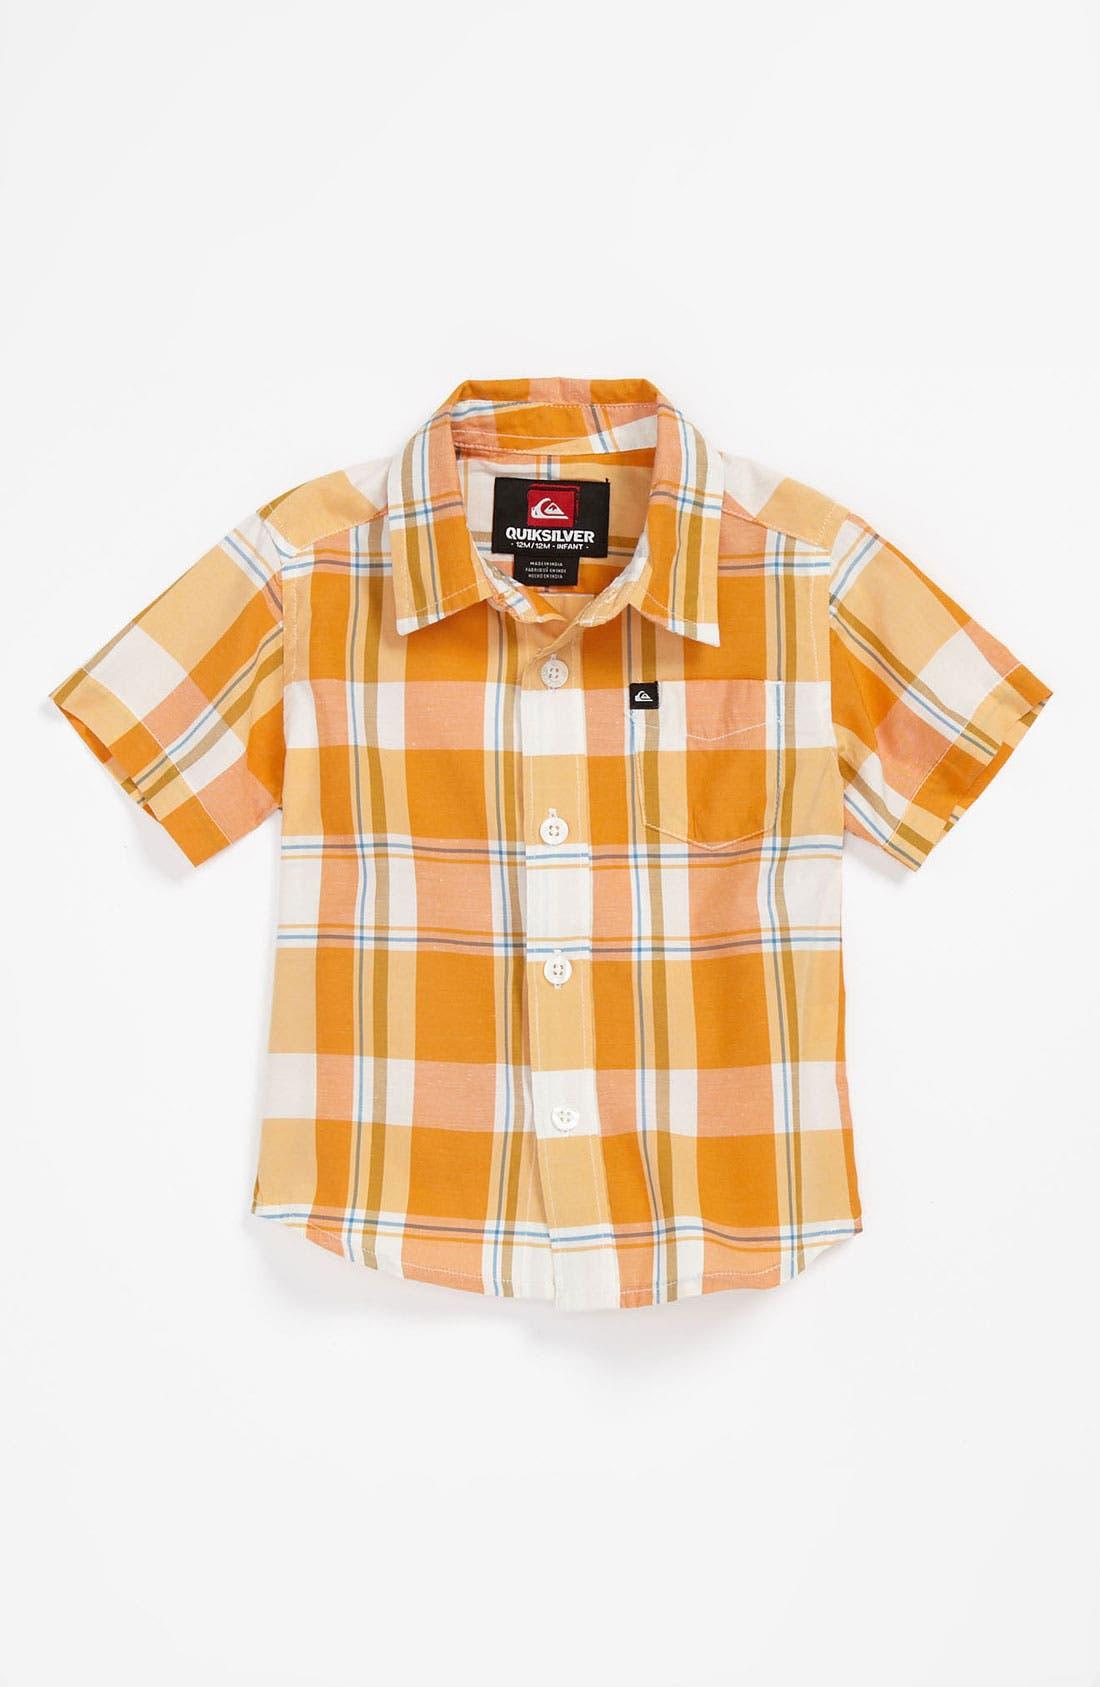 Alternate Image 1 Selected - Quiksilver 'Pat' Plaid Shirt (Baby)